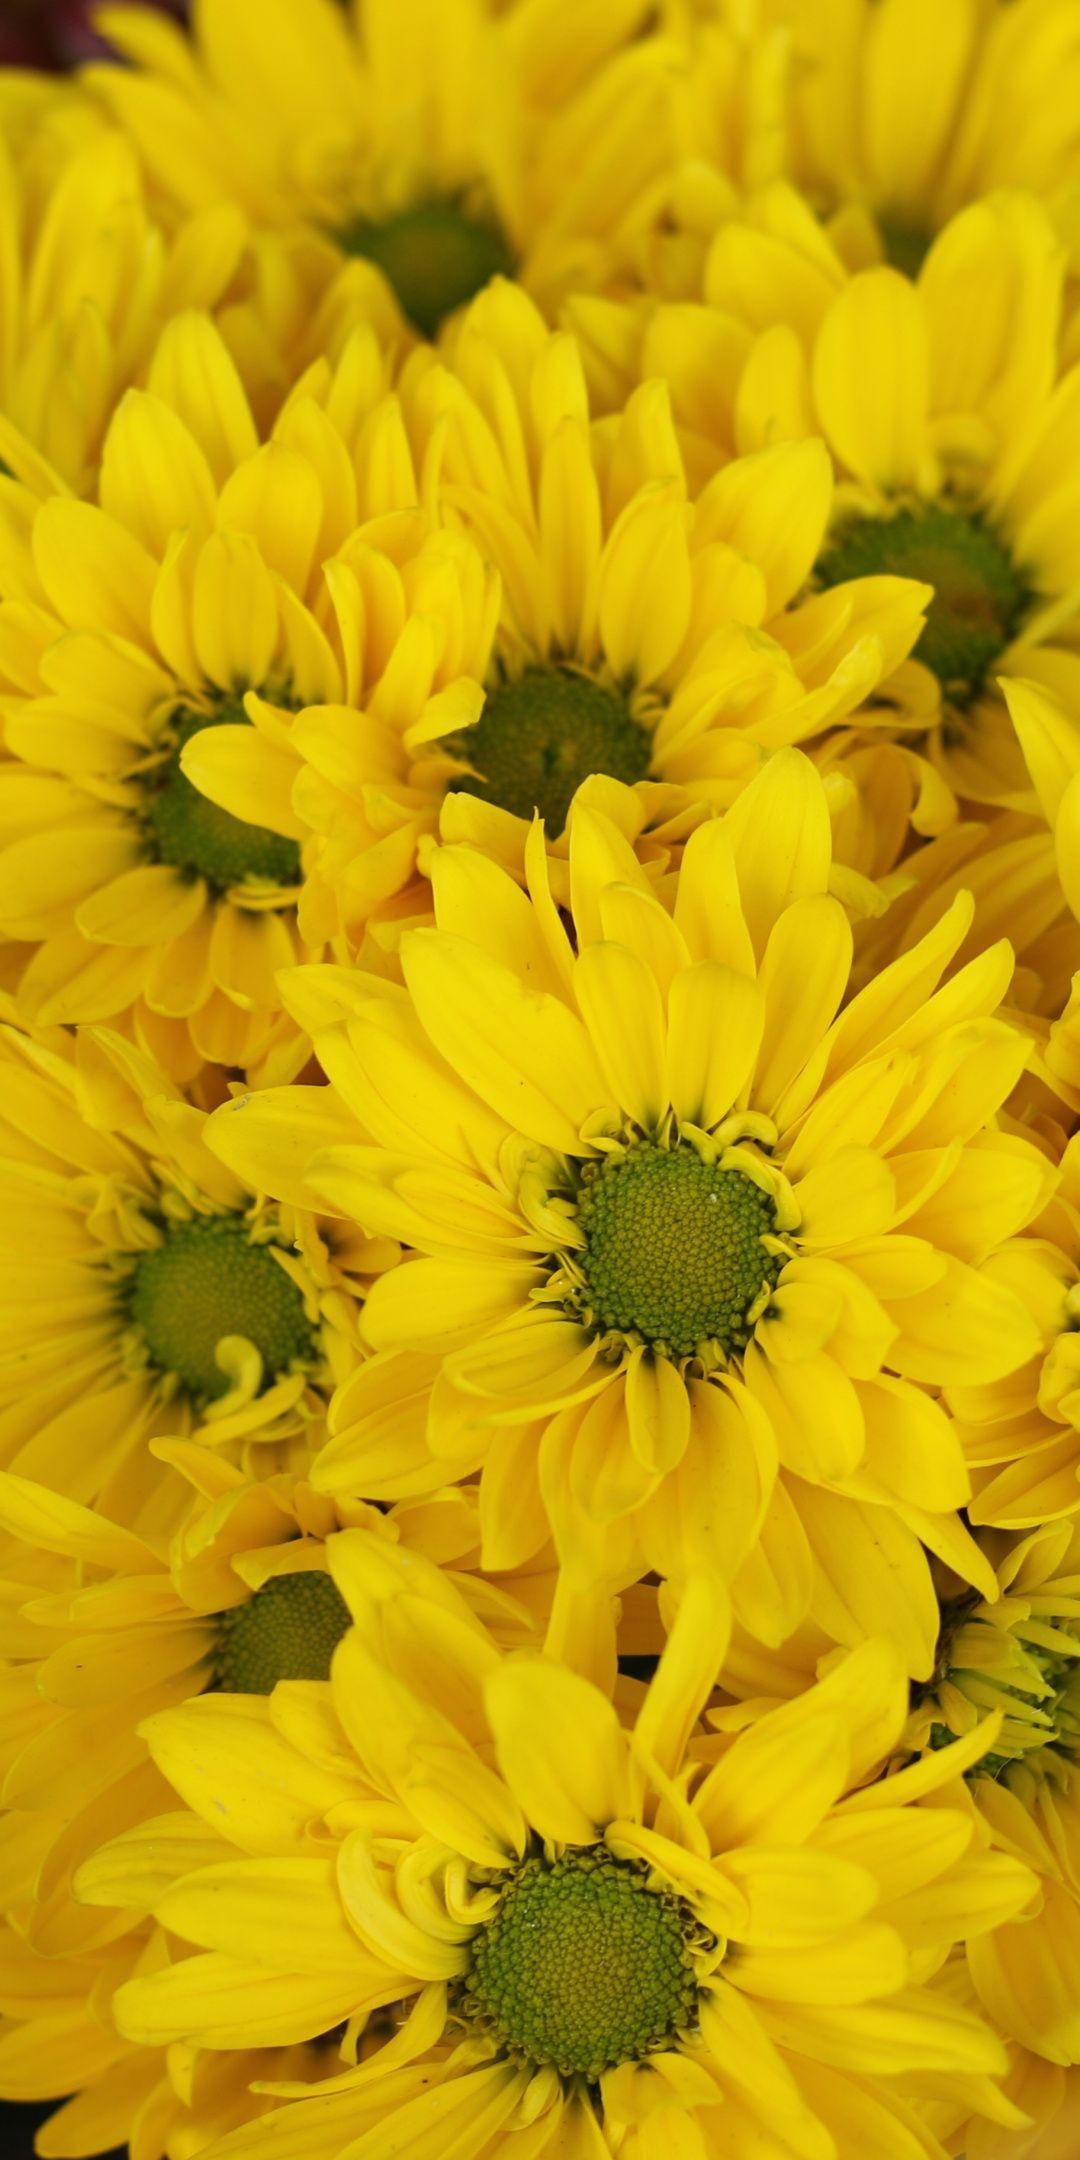 yellow flowers gerbera basket bloom 1080x2160 wallpaper yellow flower wallpaper yellow flowers yellow wallpaper yellow flower wallpaper yellow flowers